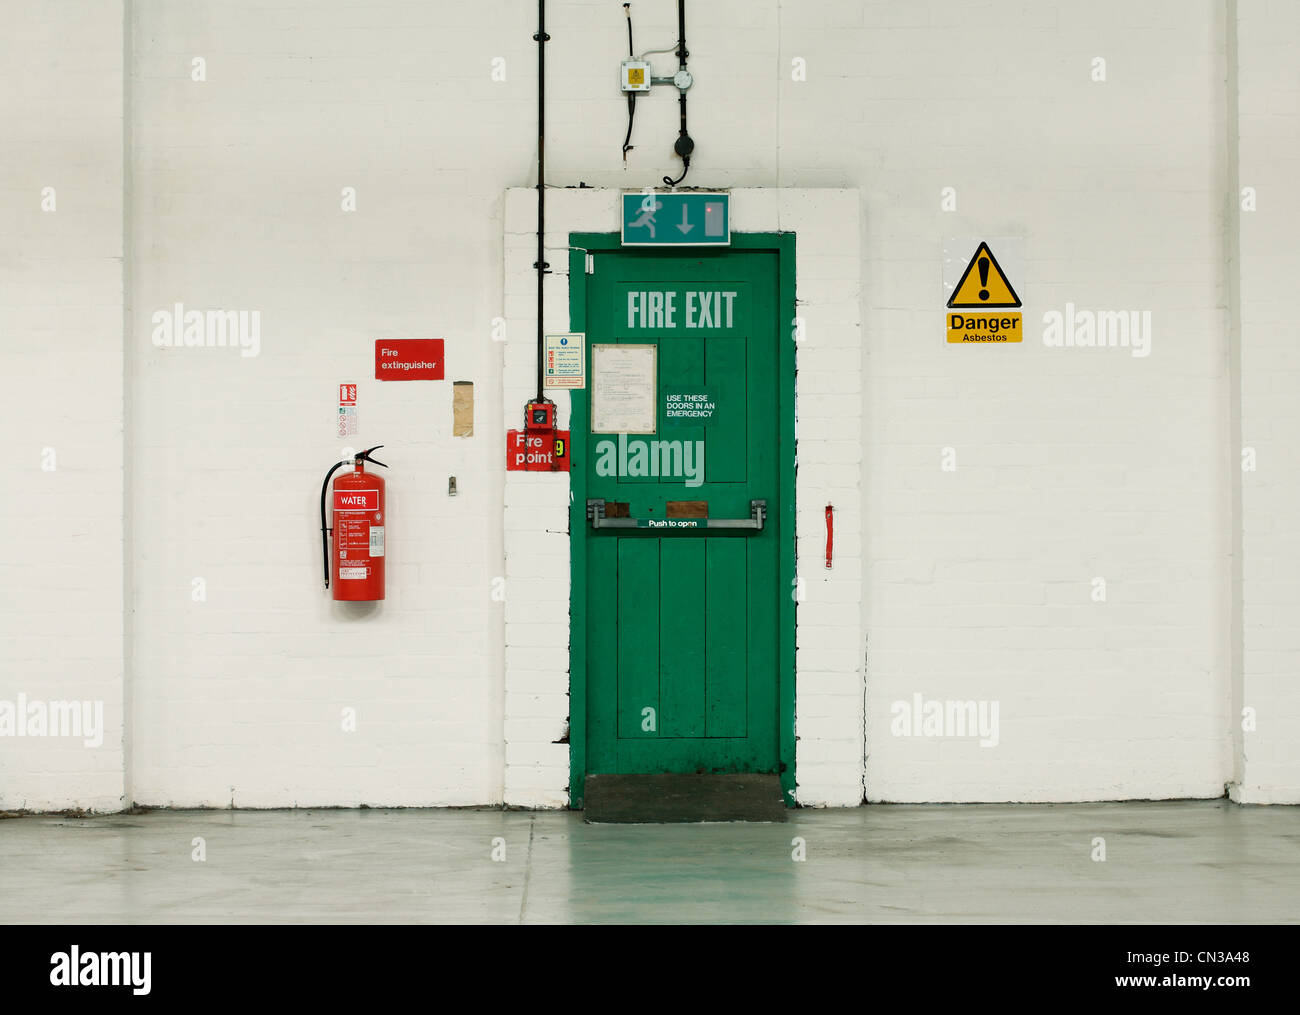 Fire exit door and signs in industrial building - Stock Image